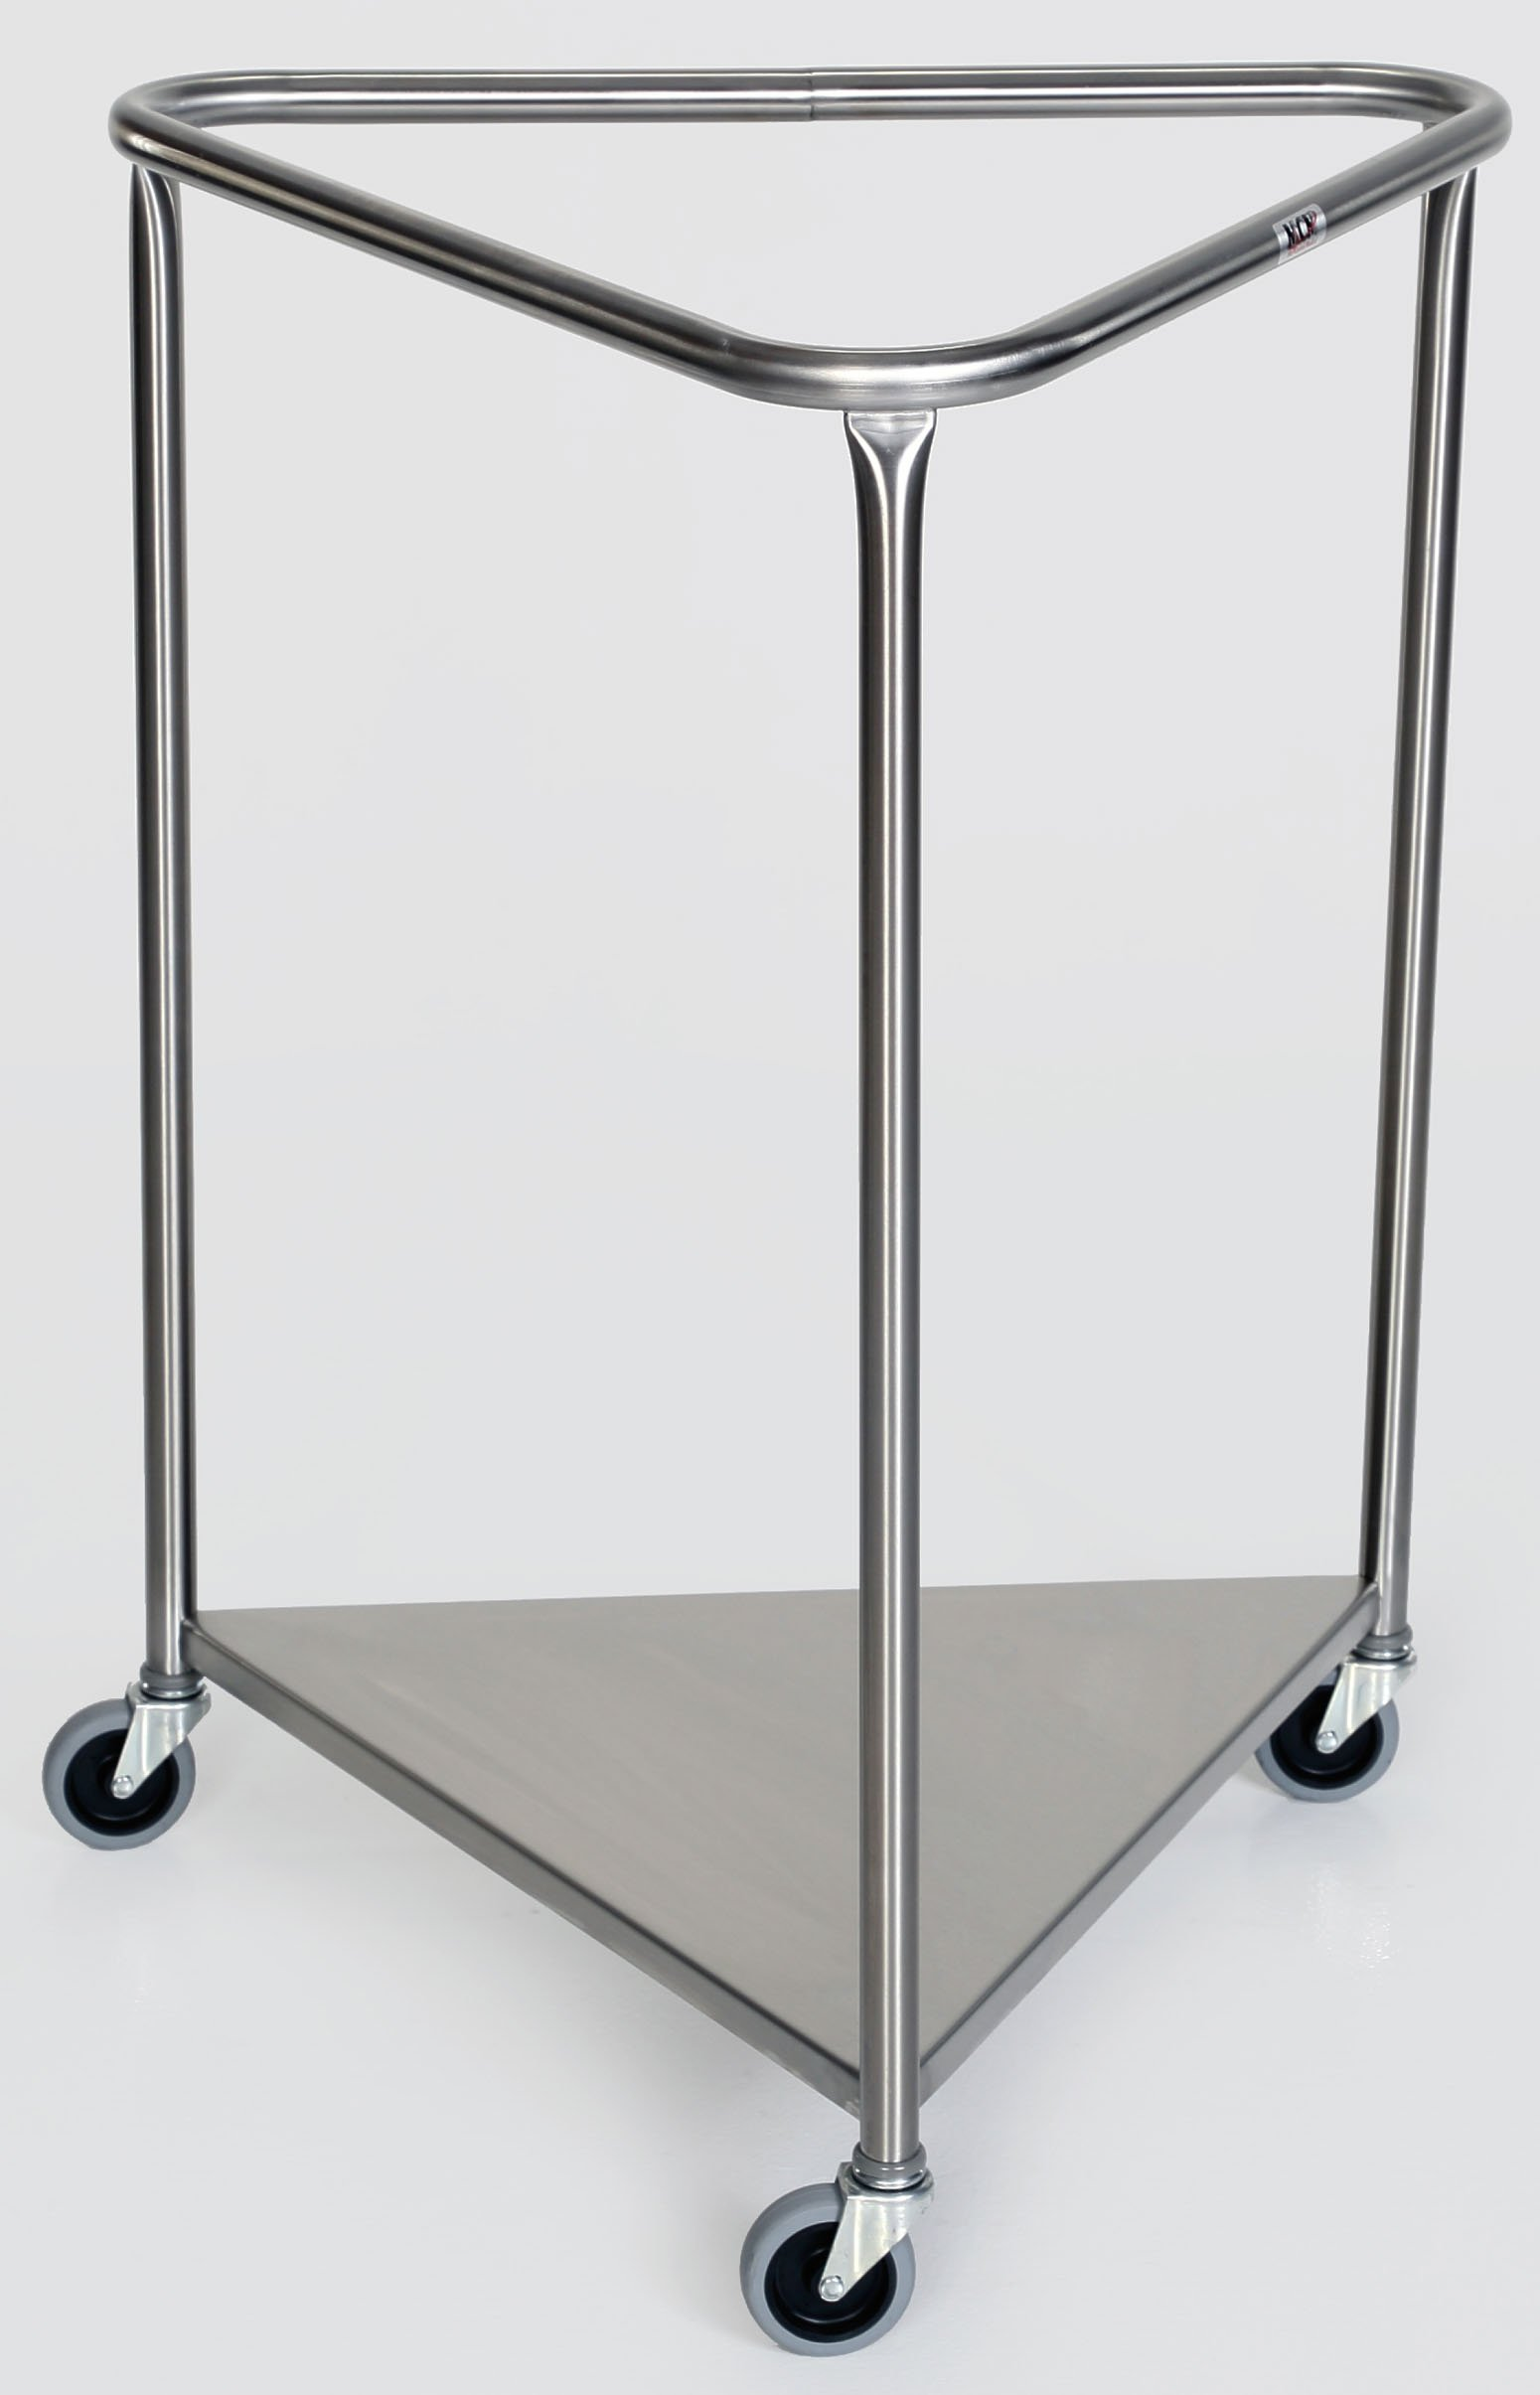 Stainless Steel Triangular Linen Hamper - 78 5/8